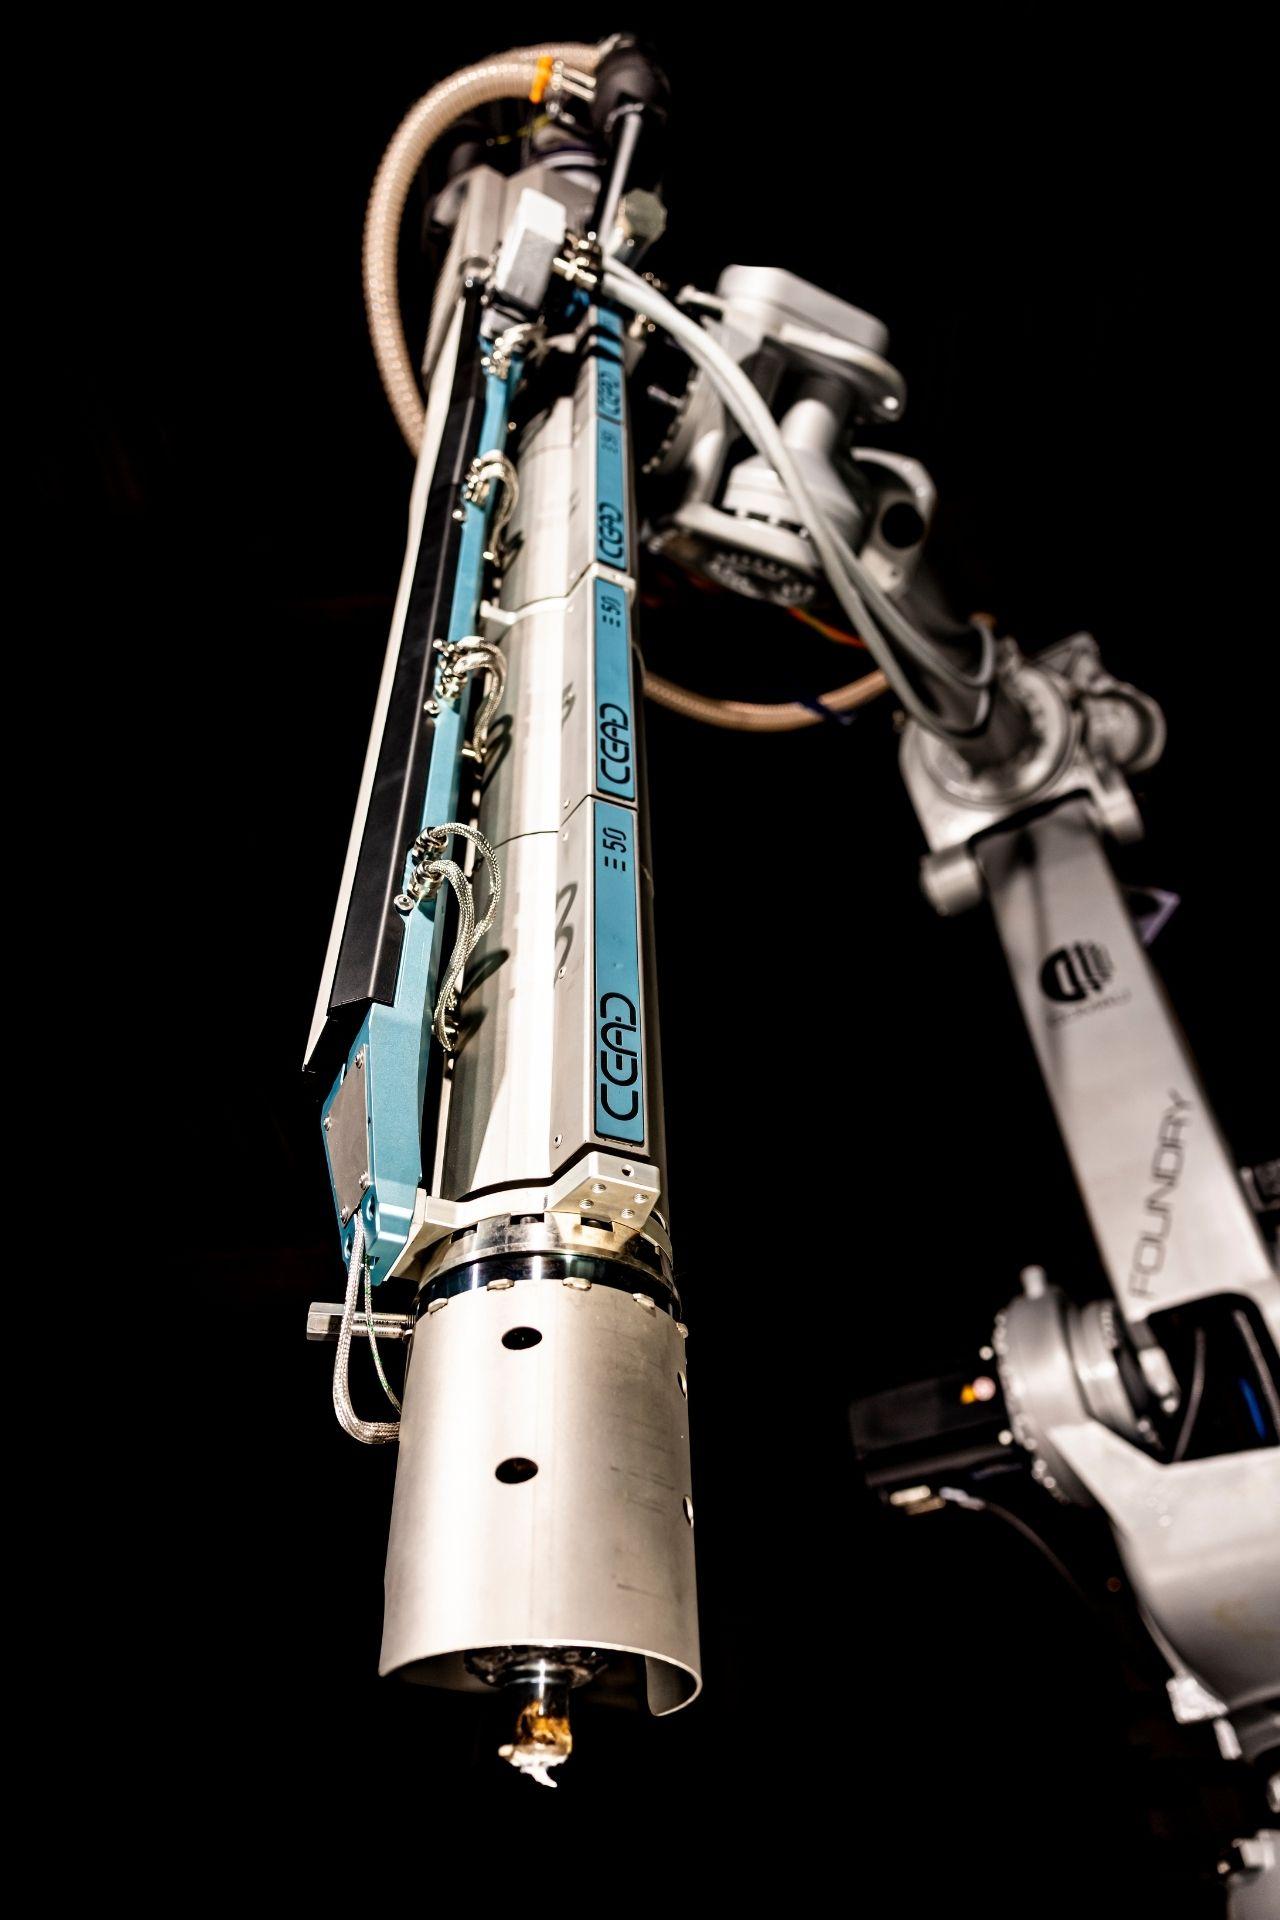 E50 Robot Extruder CEAD